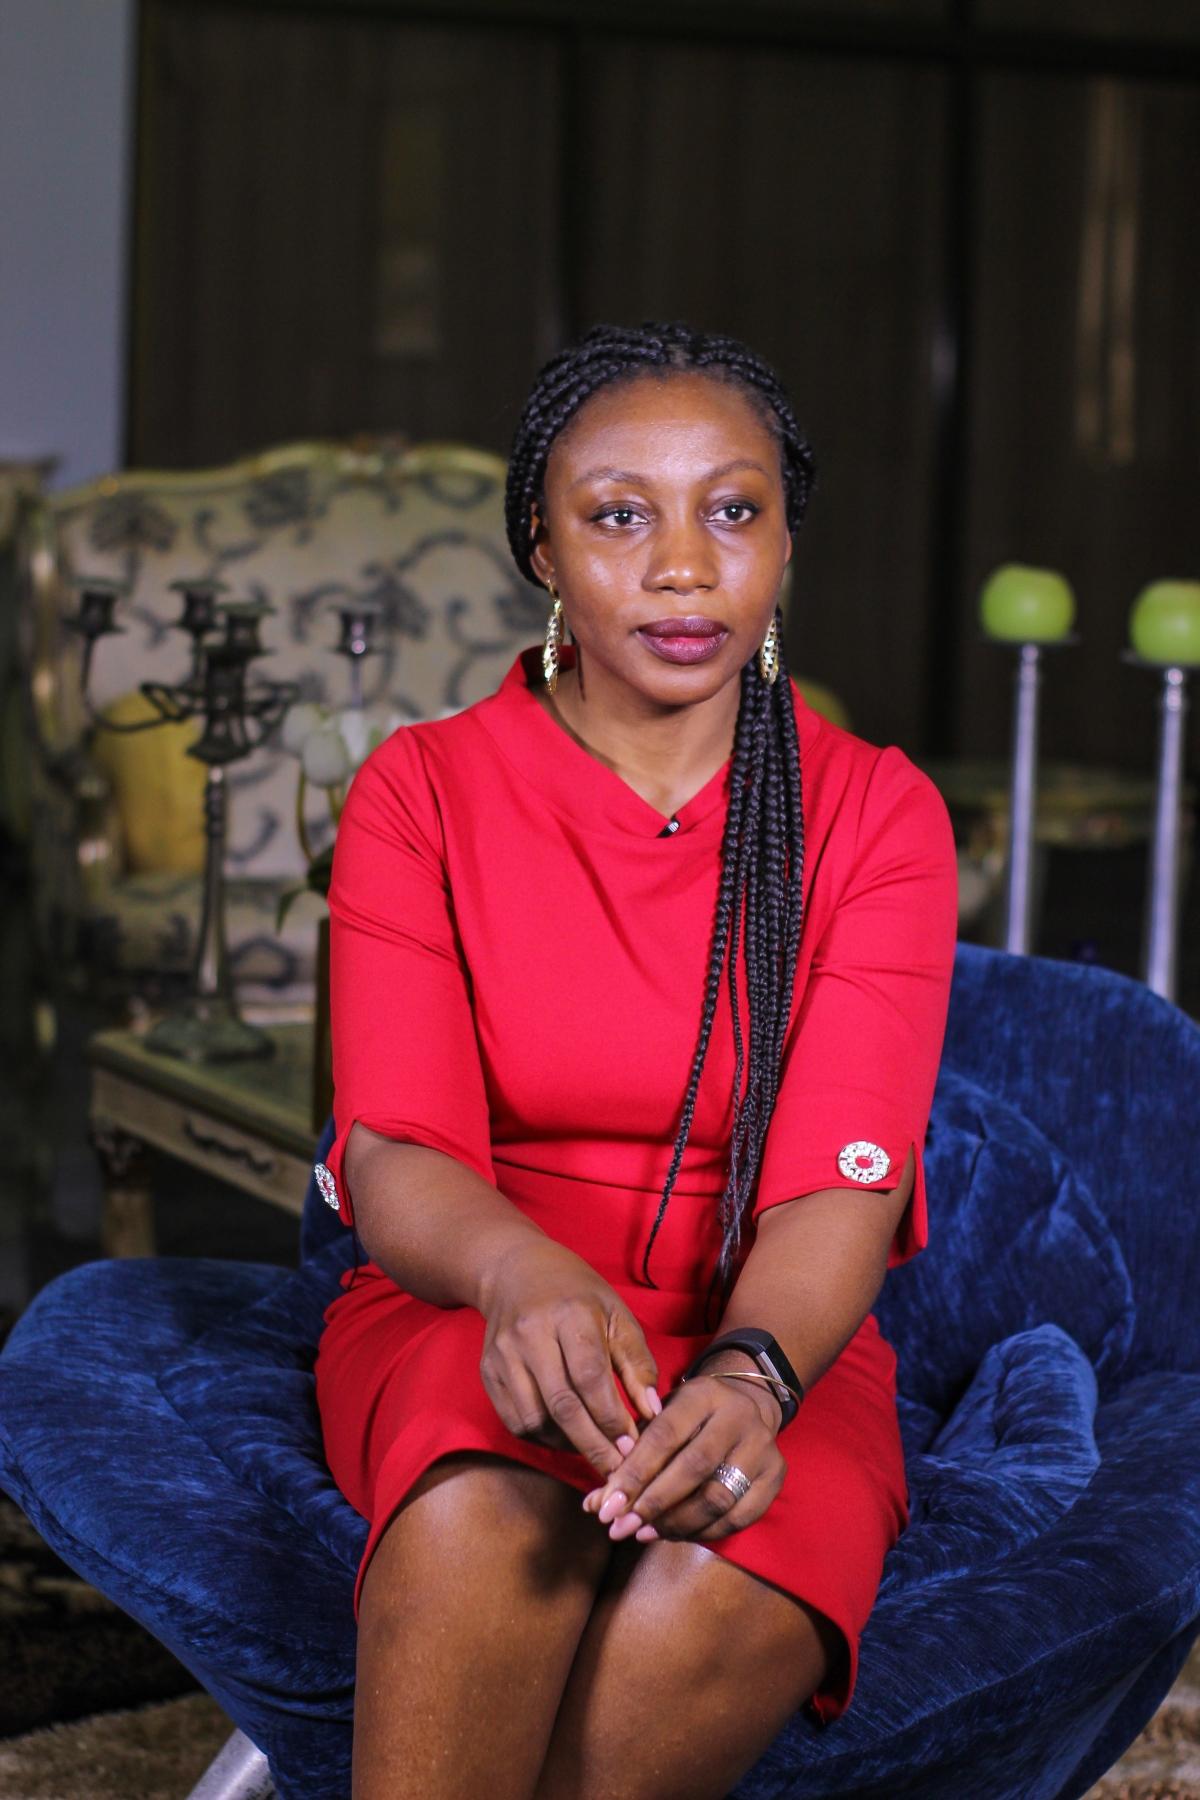 Epara Skin Care Founder and CEO, Ozohu Adoh